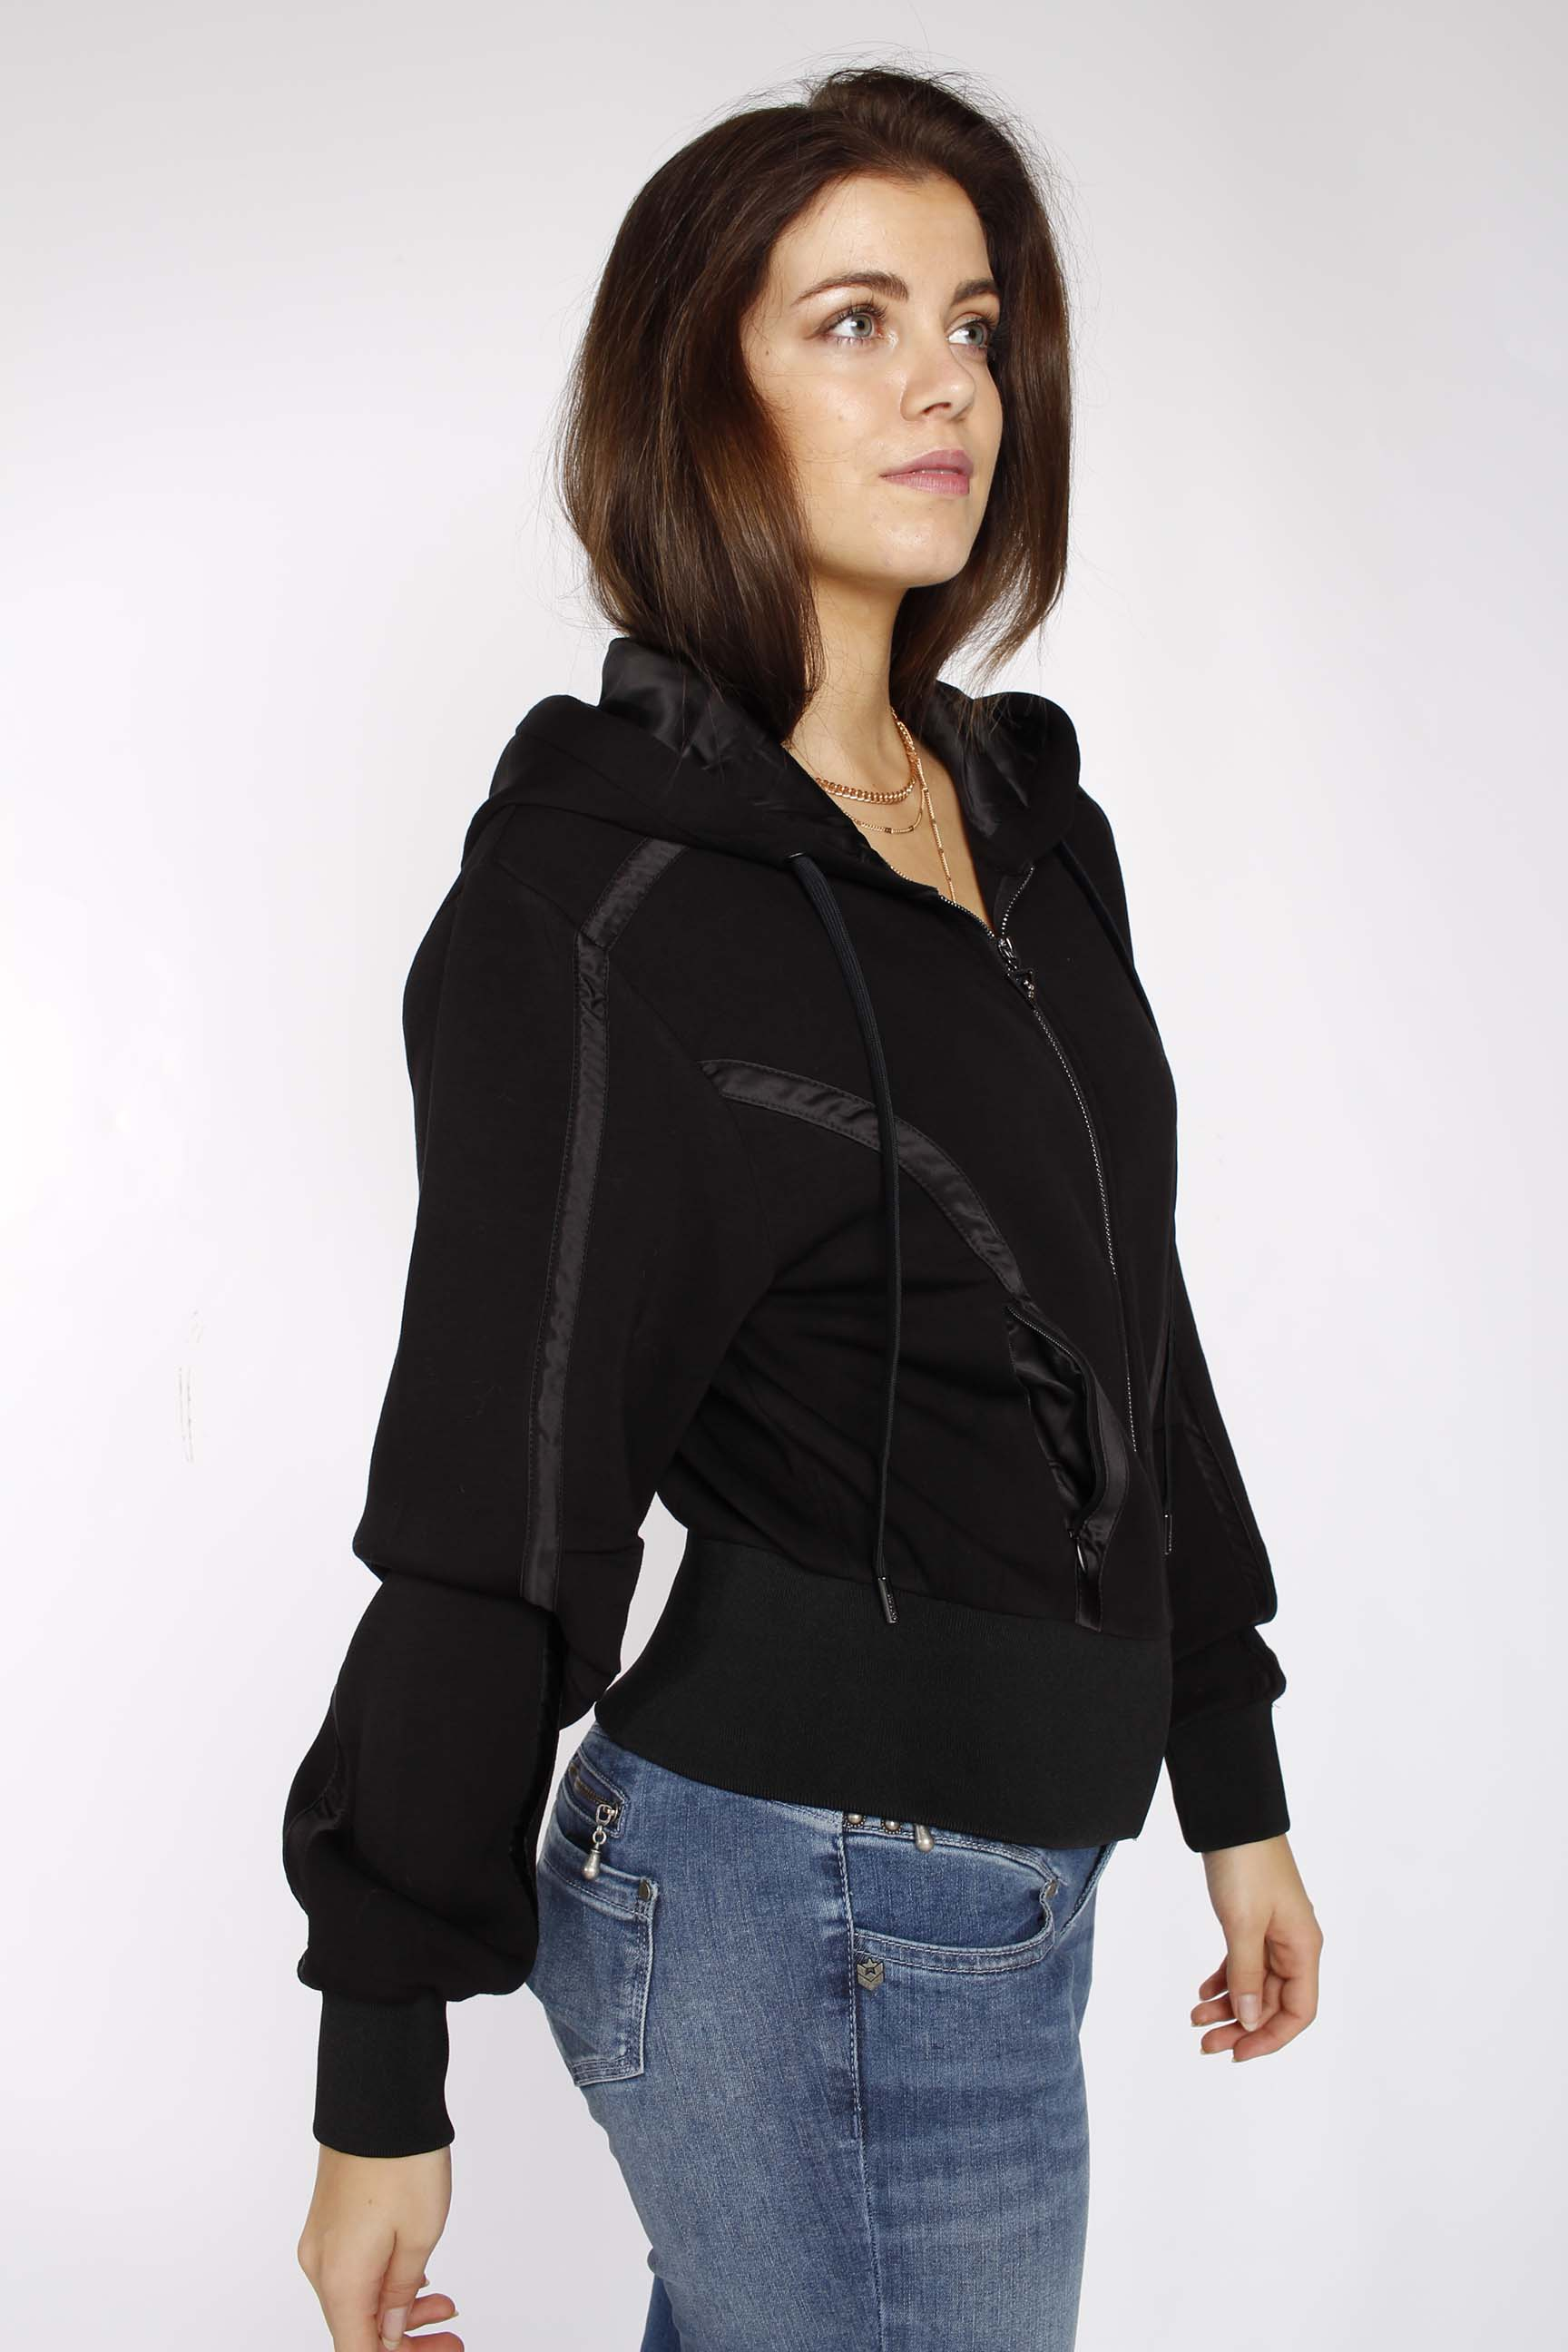 Scuba Tayler Fashion